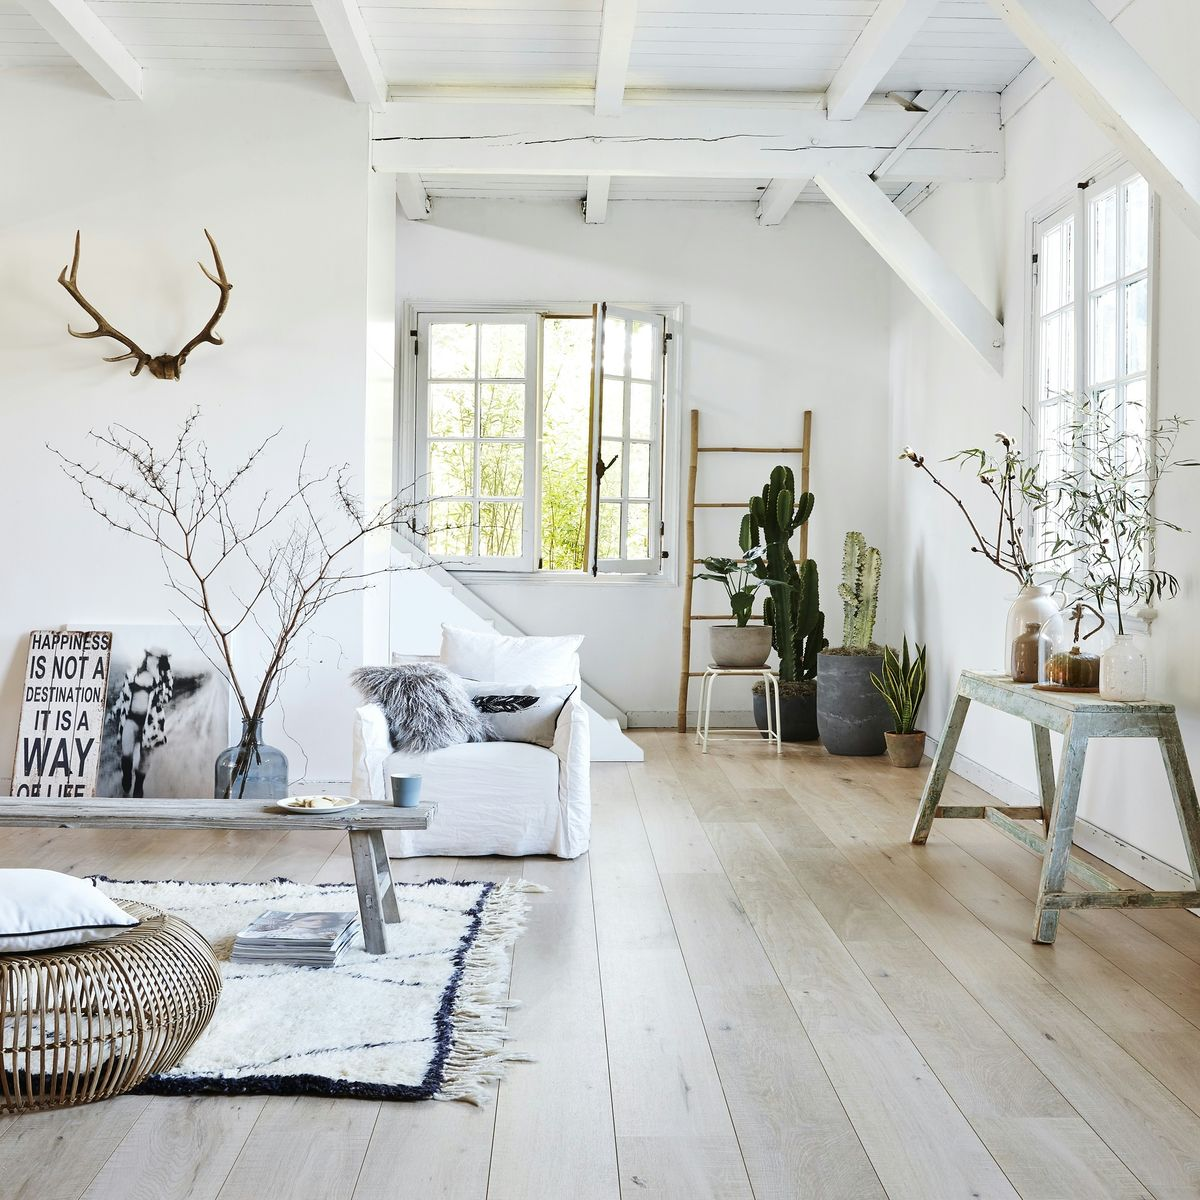 Moderne vloertegels woonkamer voorbeelden tg wonen shop for Moderne woonkamer